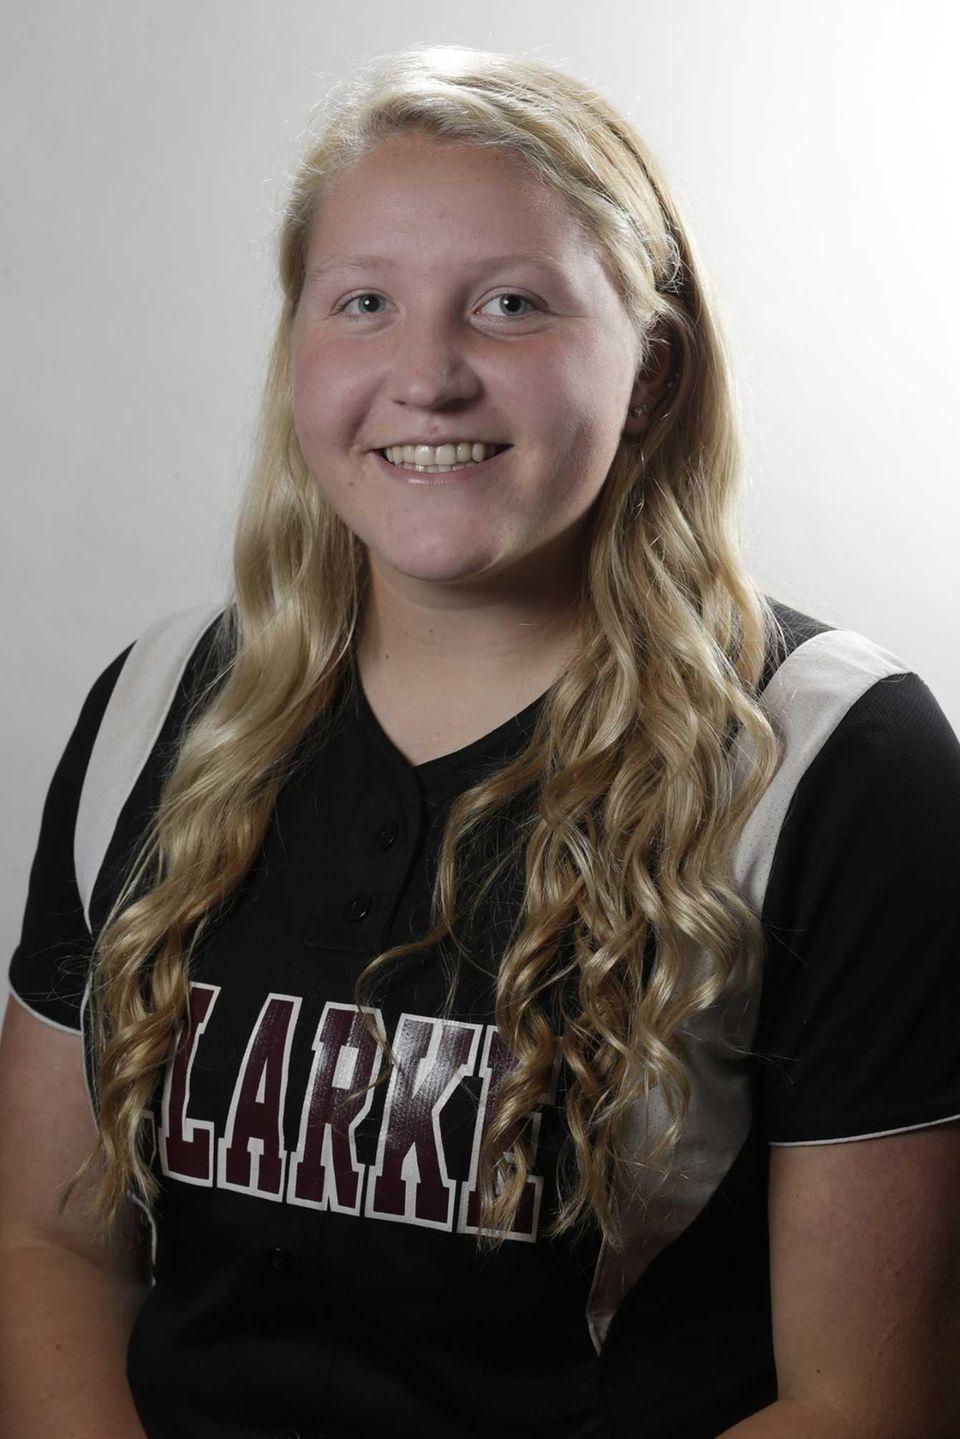 Cornell's six years on the Clarke softball team